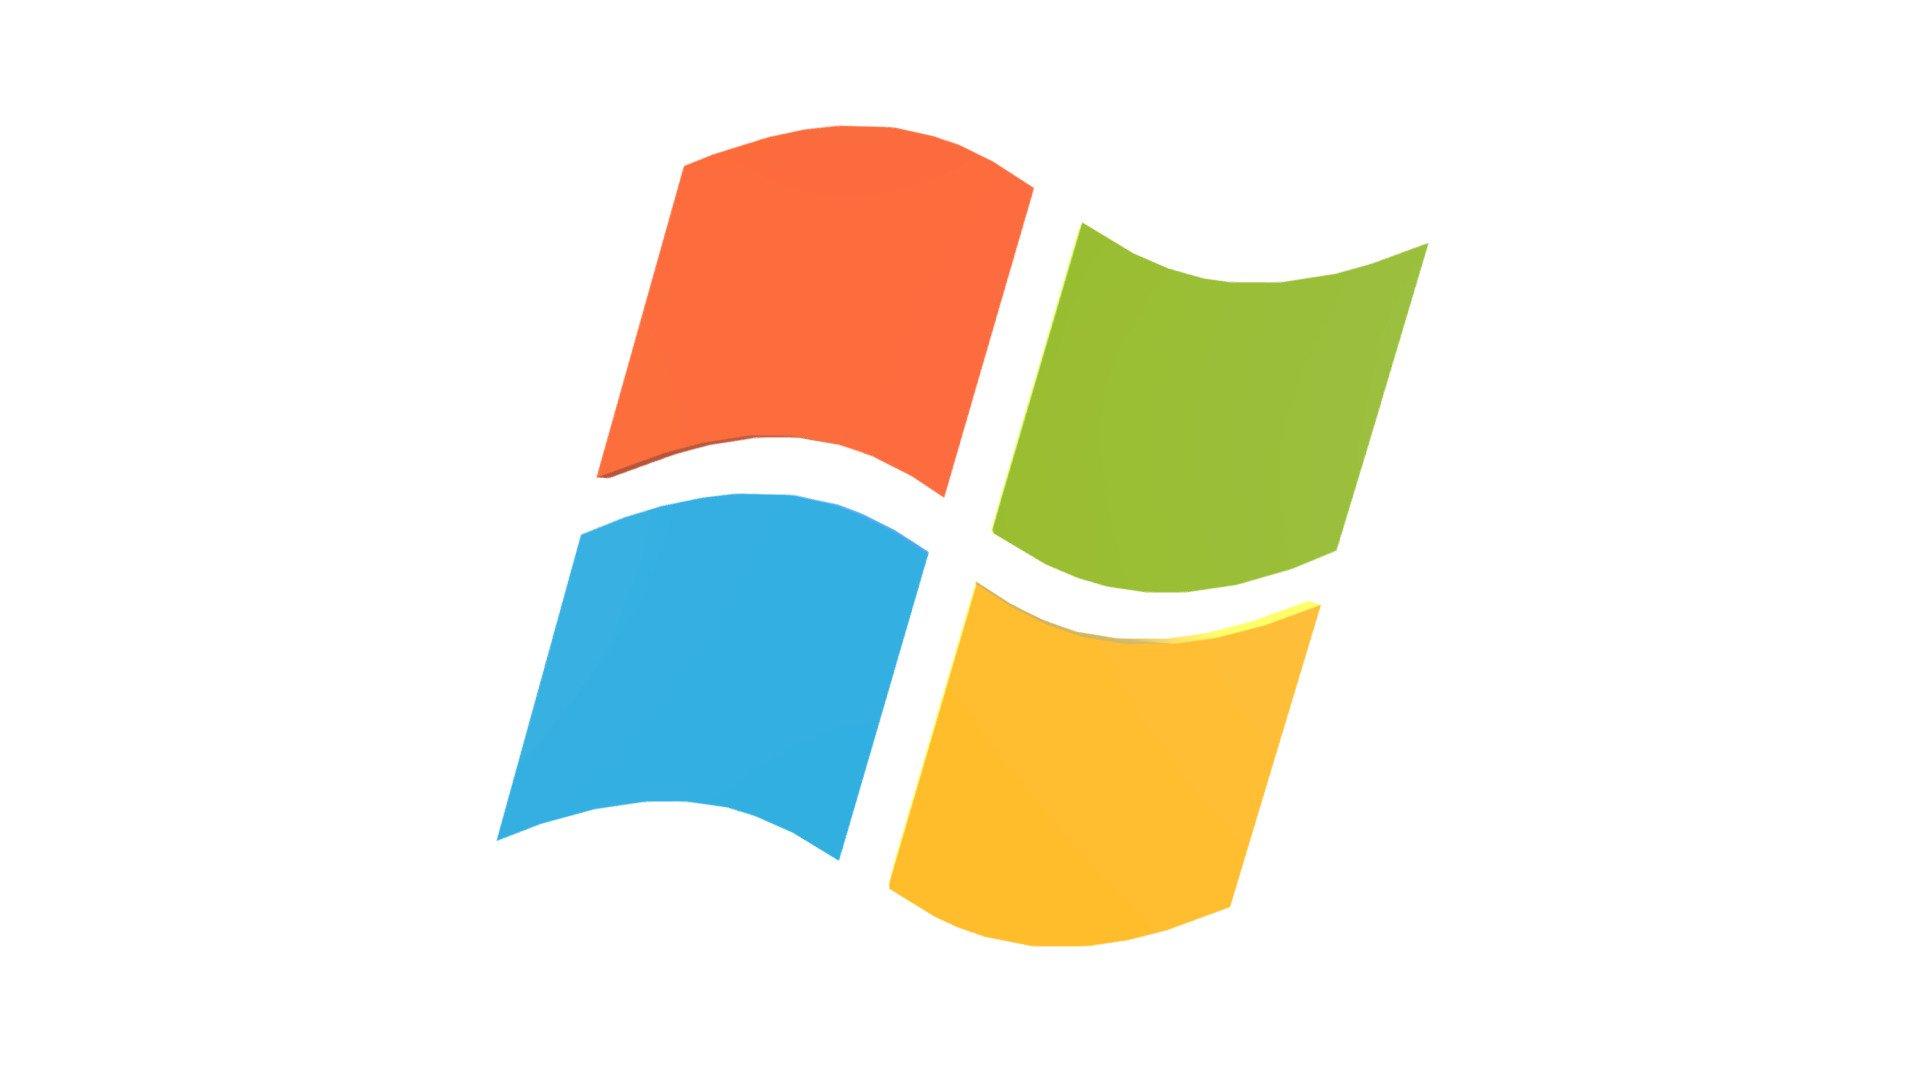 Windows XP Logo - Buy Royalty Free 3D model by Aldo (@aldo.a.y) [675a466]